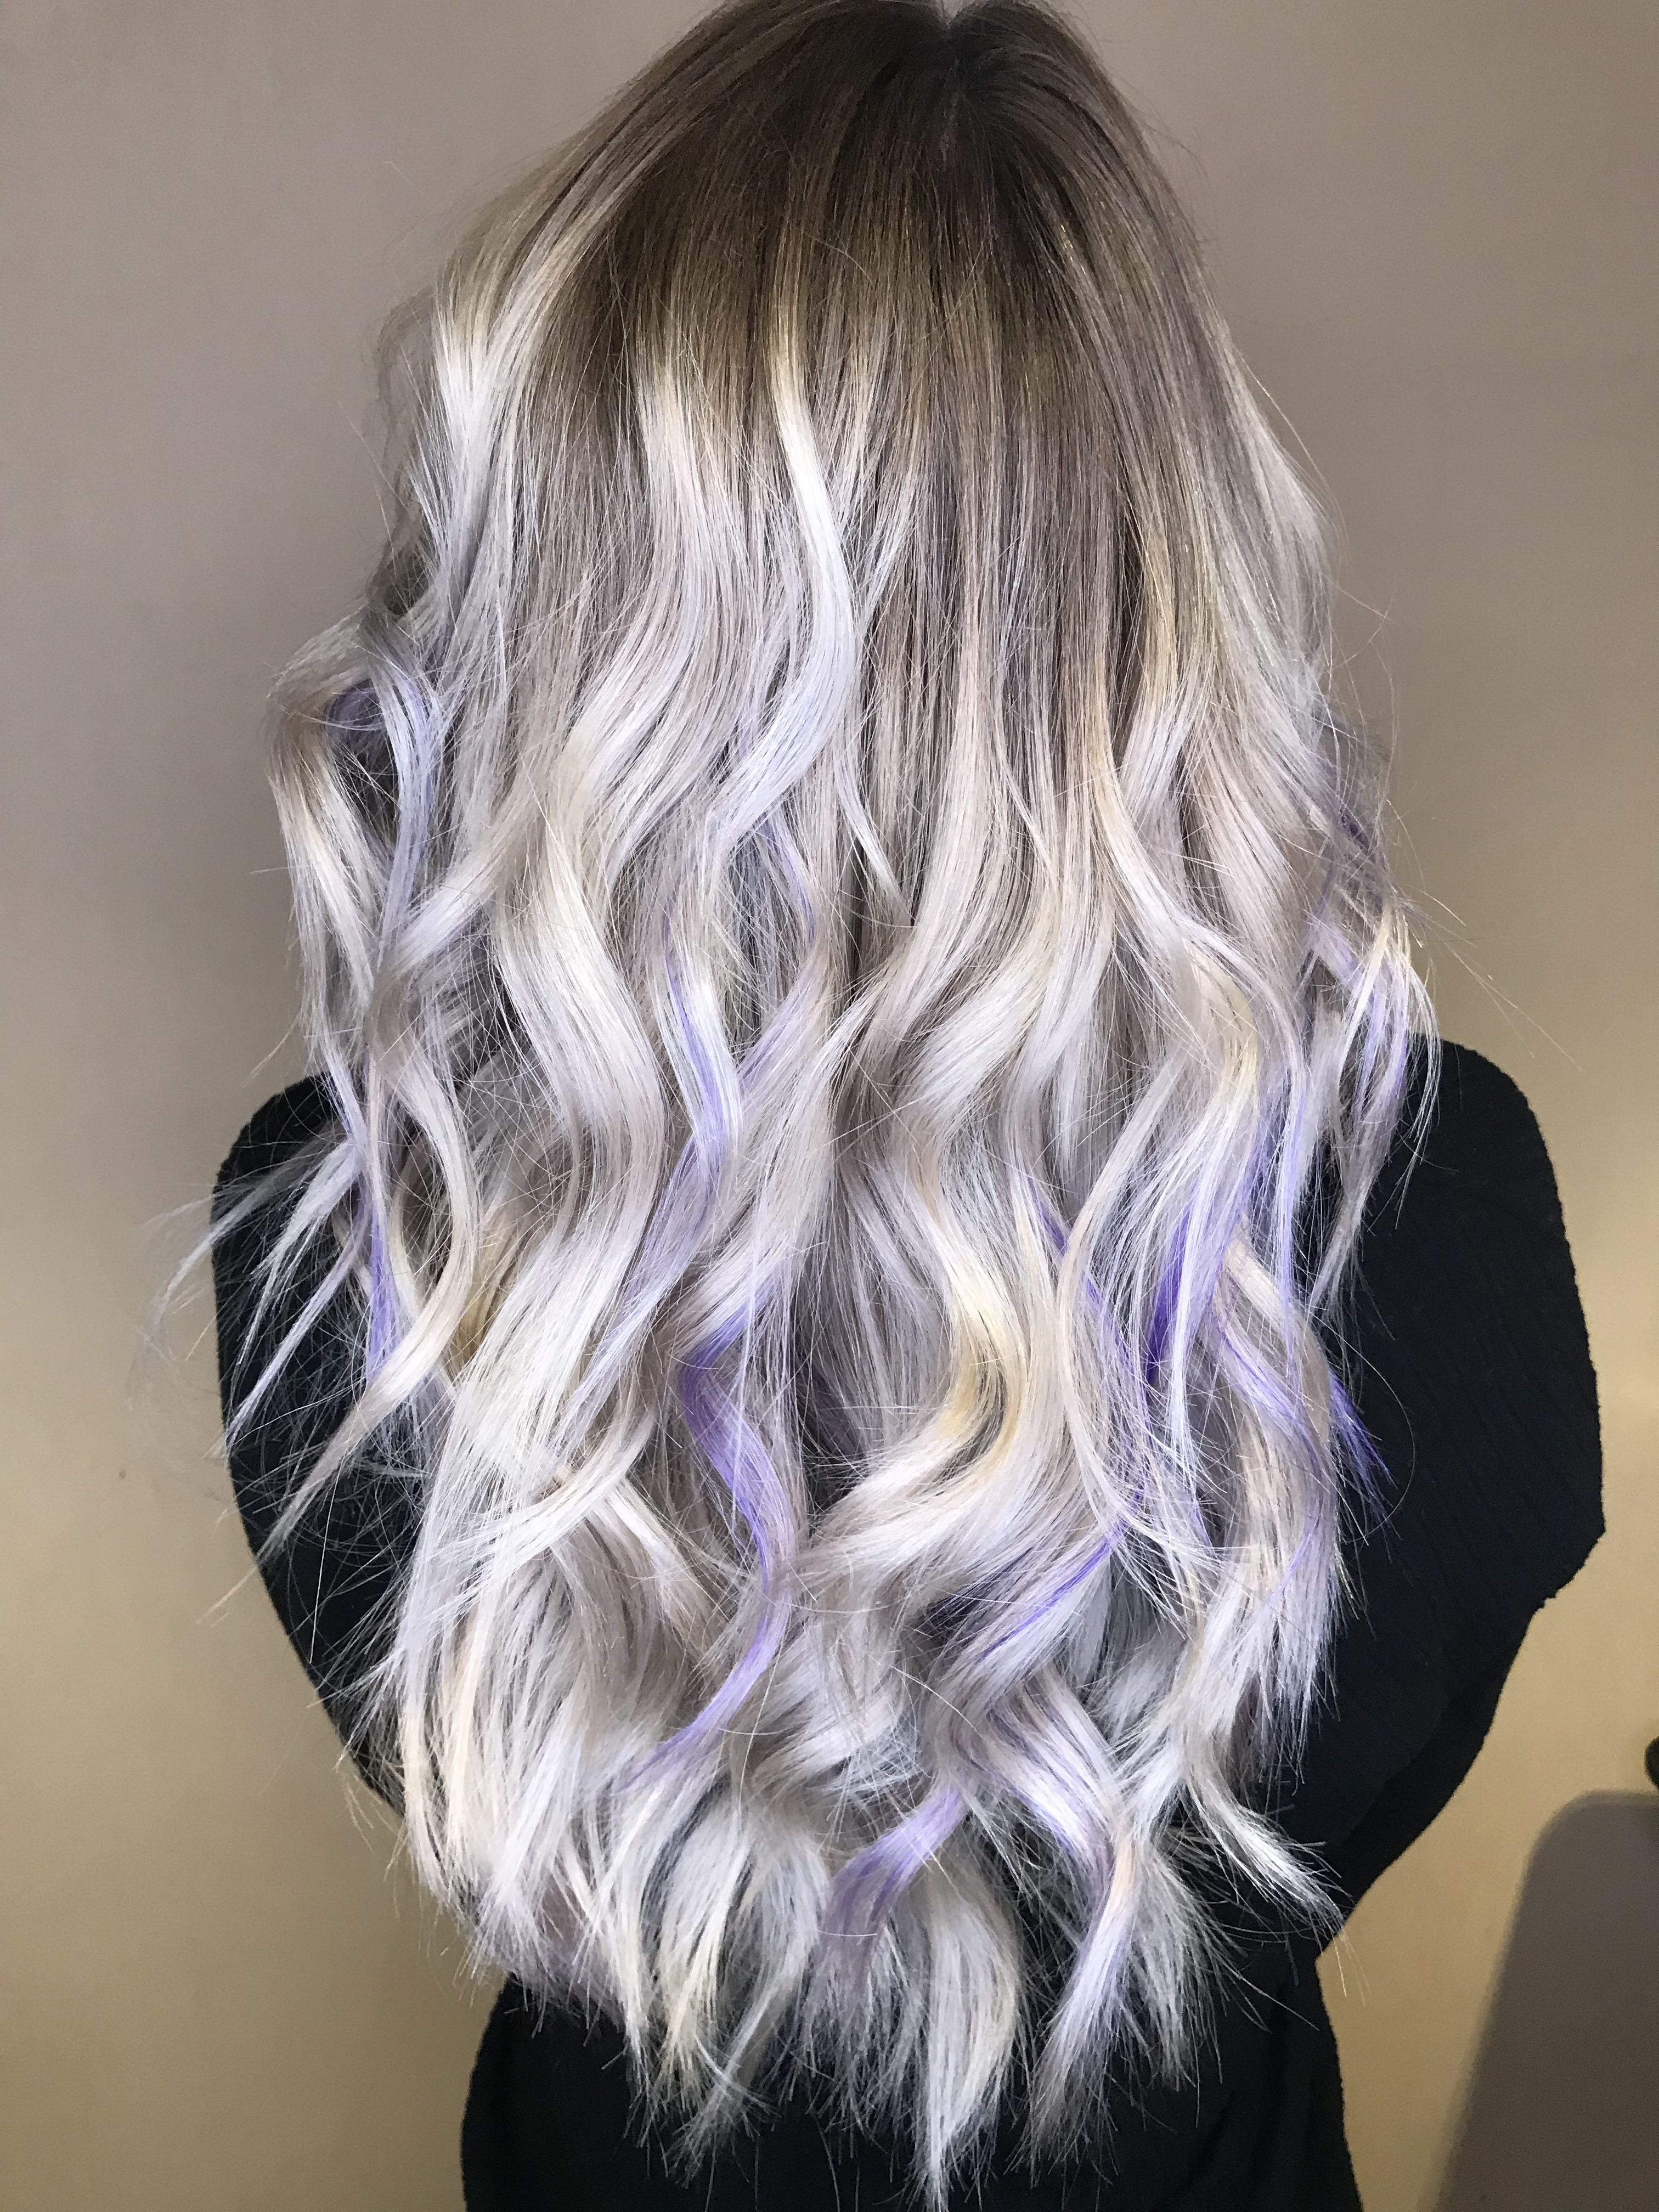 Lavender Blonde Balayage By Paintedlocks Follow On Ig Purple Blonde Hair Purple Hair Highlights Purple Highlights Blonde Hair